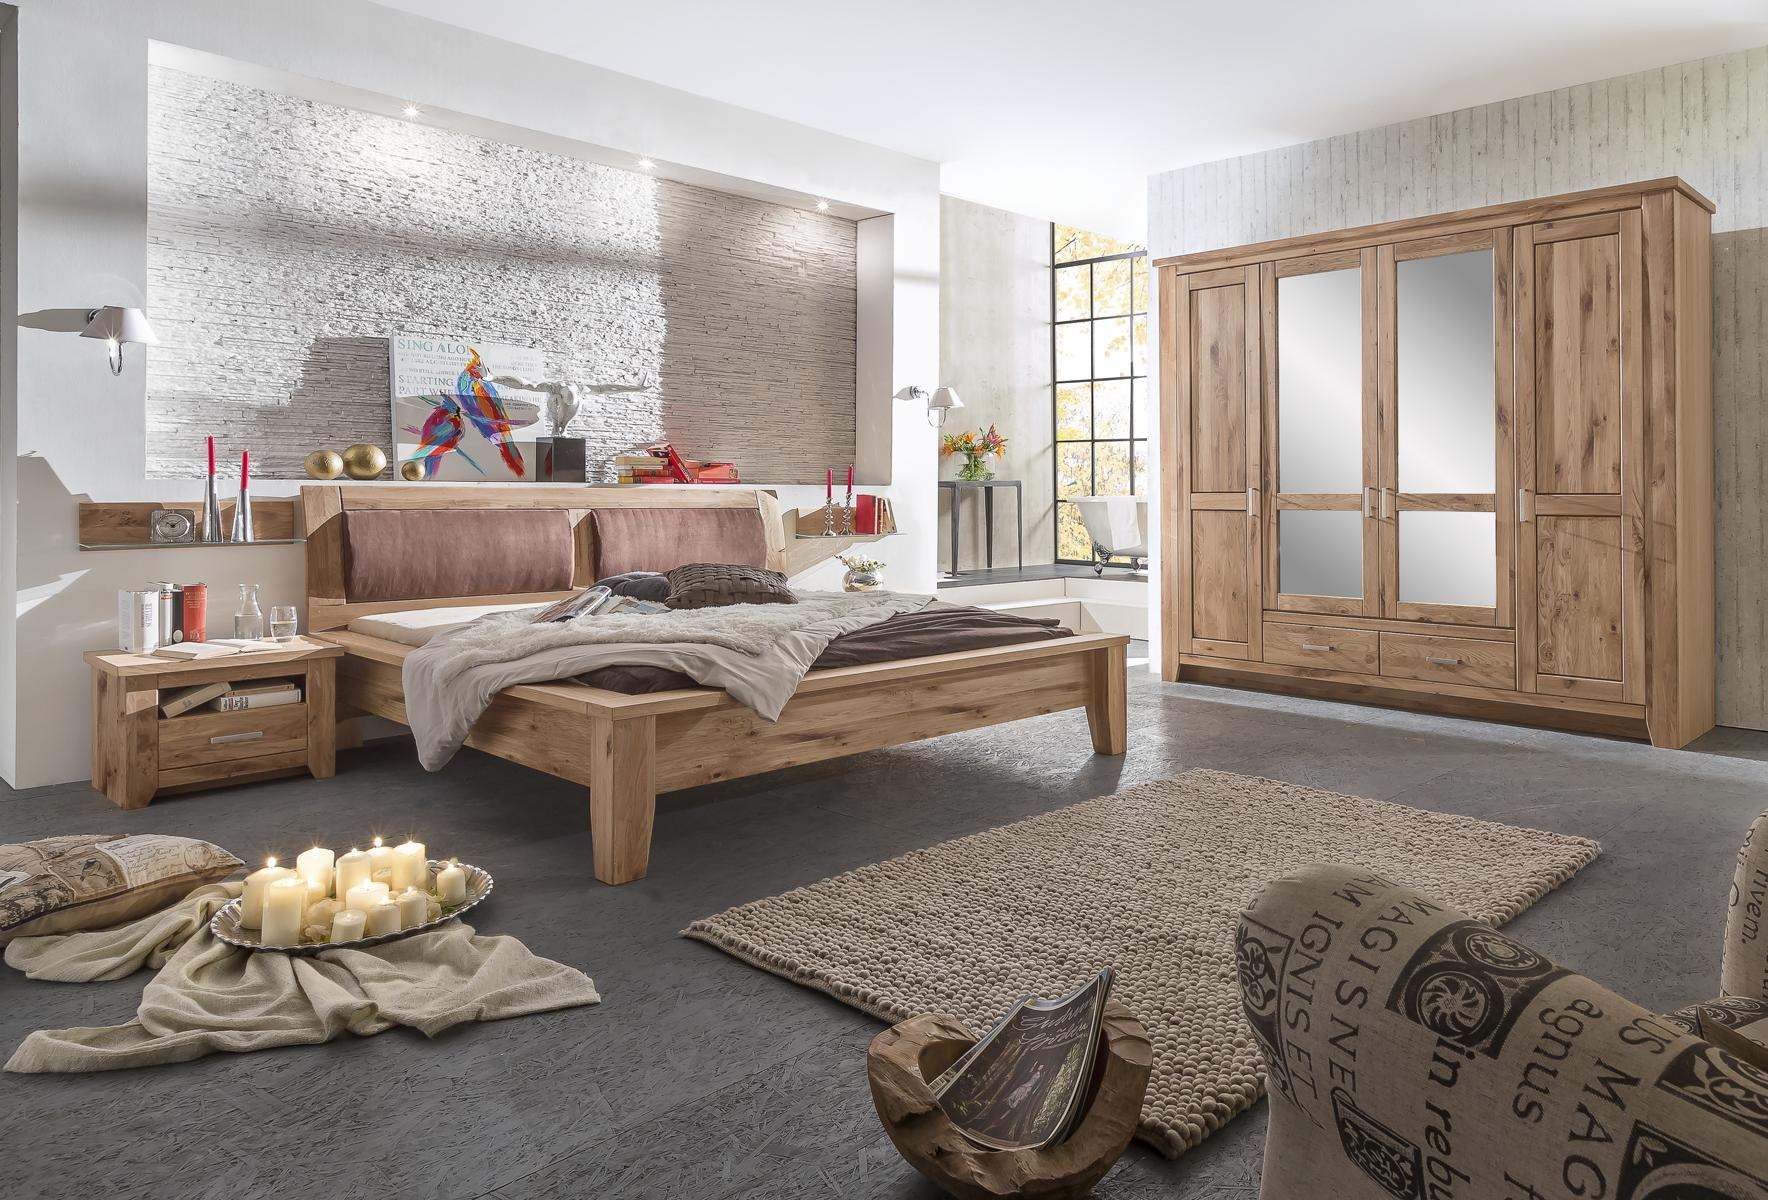 bett 200x200 cm tina landhausstil asteiche massiv ge lt 50 el tr 50. Black Bedroom Furniture Sets. Home Design Ideas